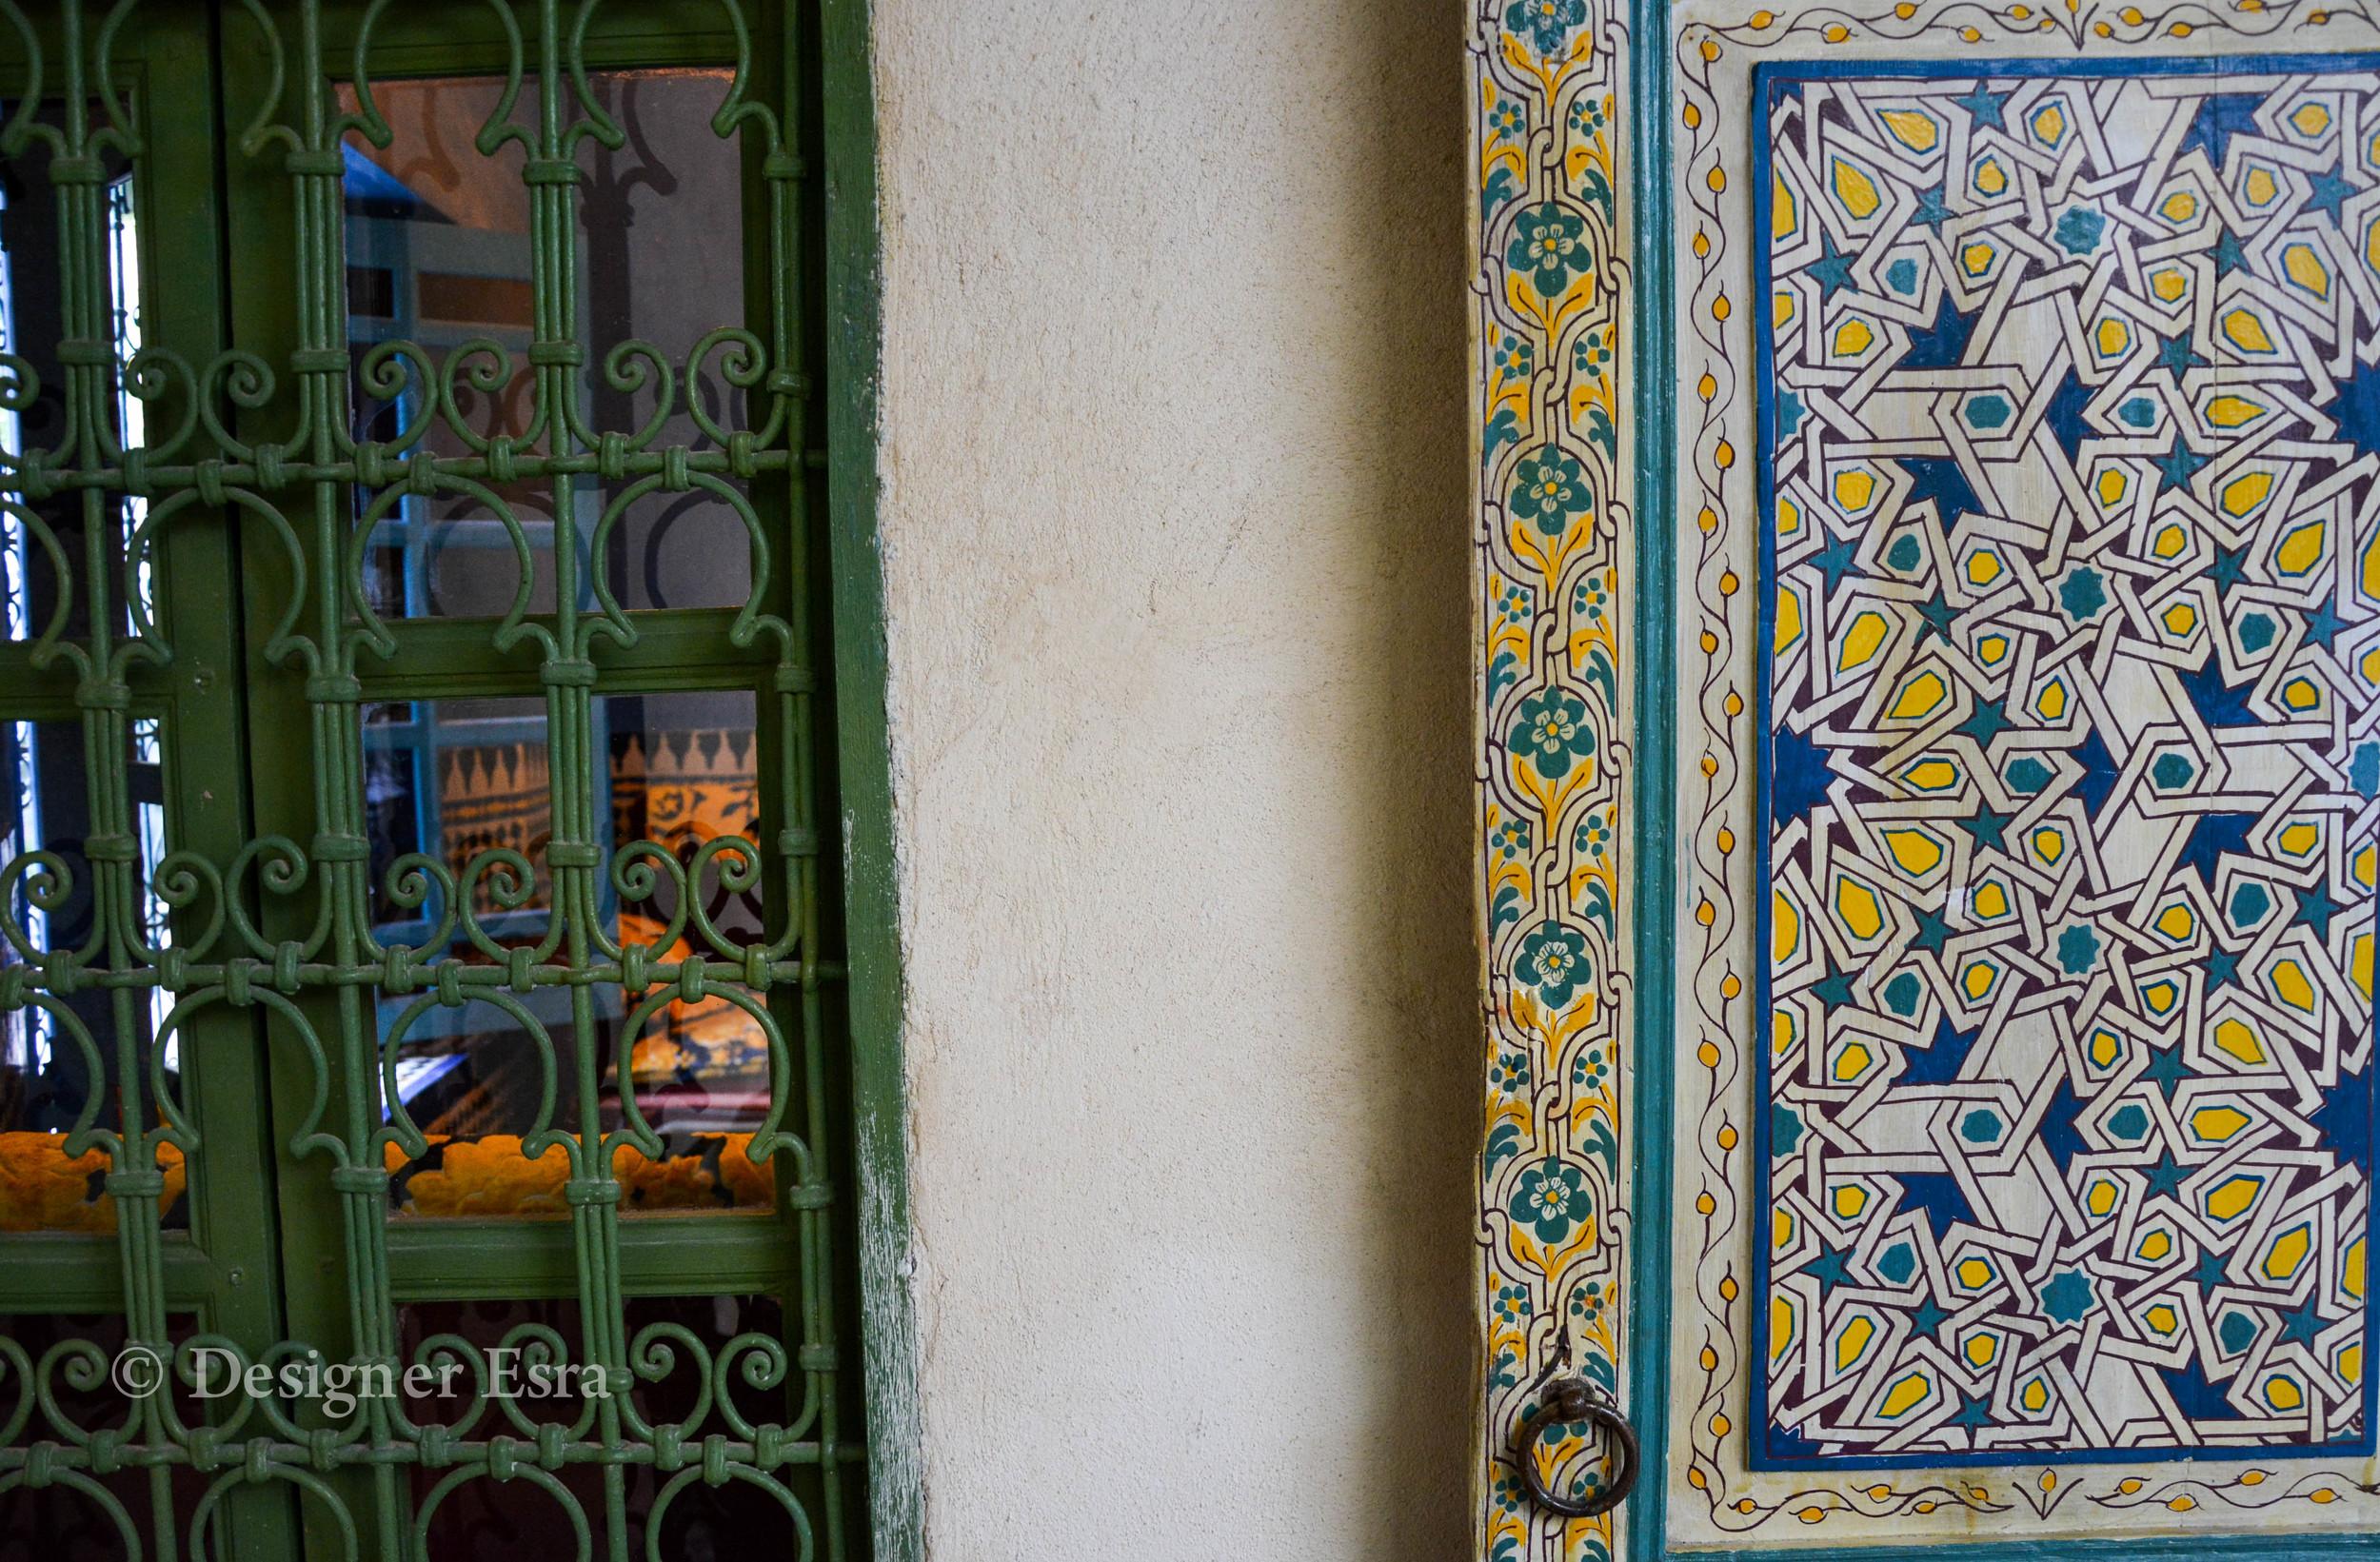 Islamic Pattern on Wooden Door